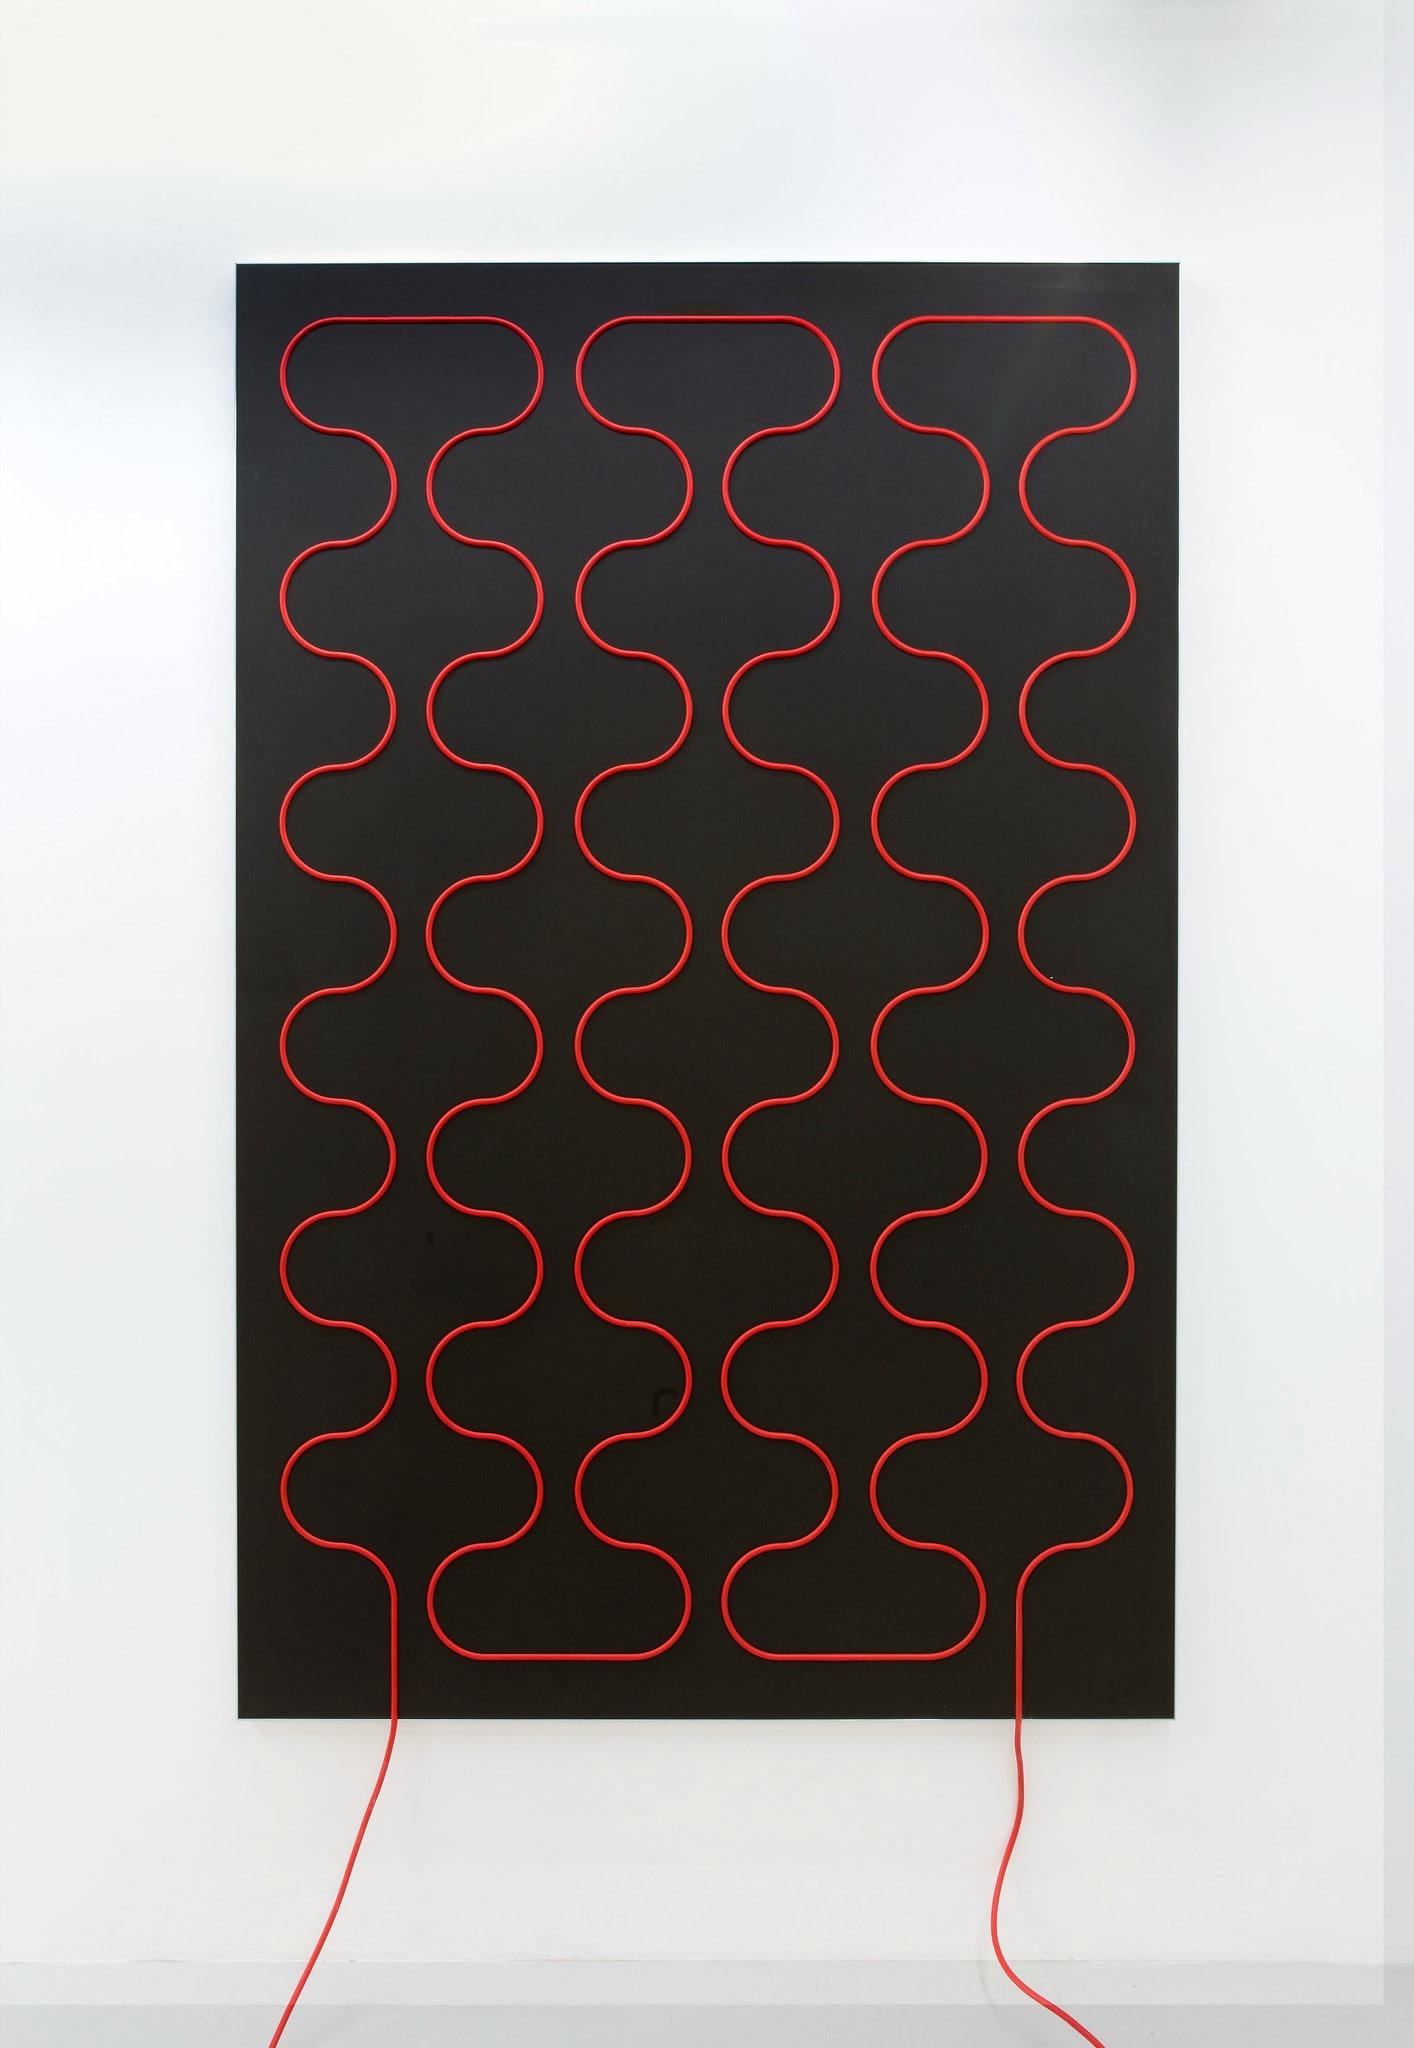 <span class=&#34;link fancybox-details-link&#34;><a href=&#34;/artists/44-jacob-dahlgren/works/8763/&#34;>View Detail Page</a></span><div class=&#34;artist&#34;><strong>Jacob Dahlgren</strong></div> <div class=&#34;title&#34;><em>Third Uncle #8</em>, 2015</div> <div class=&#34;medium&#34;>MDF, acrylic paint, electrical cable, aluminium</div> <div class=&#34;dimensions&#34;>199 x 122 cm<br />78 3/8 x 52 in</div><div class=&#34;copyright_line&#34;>Copyright The Artist</div>